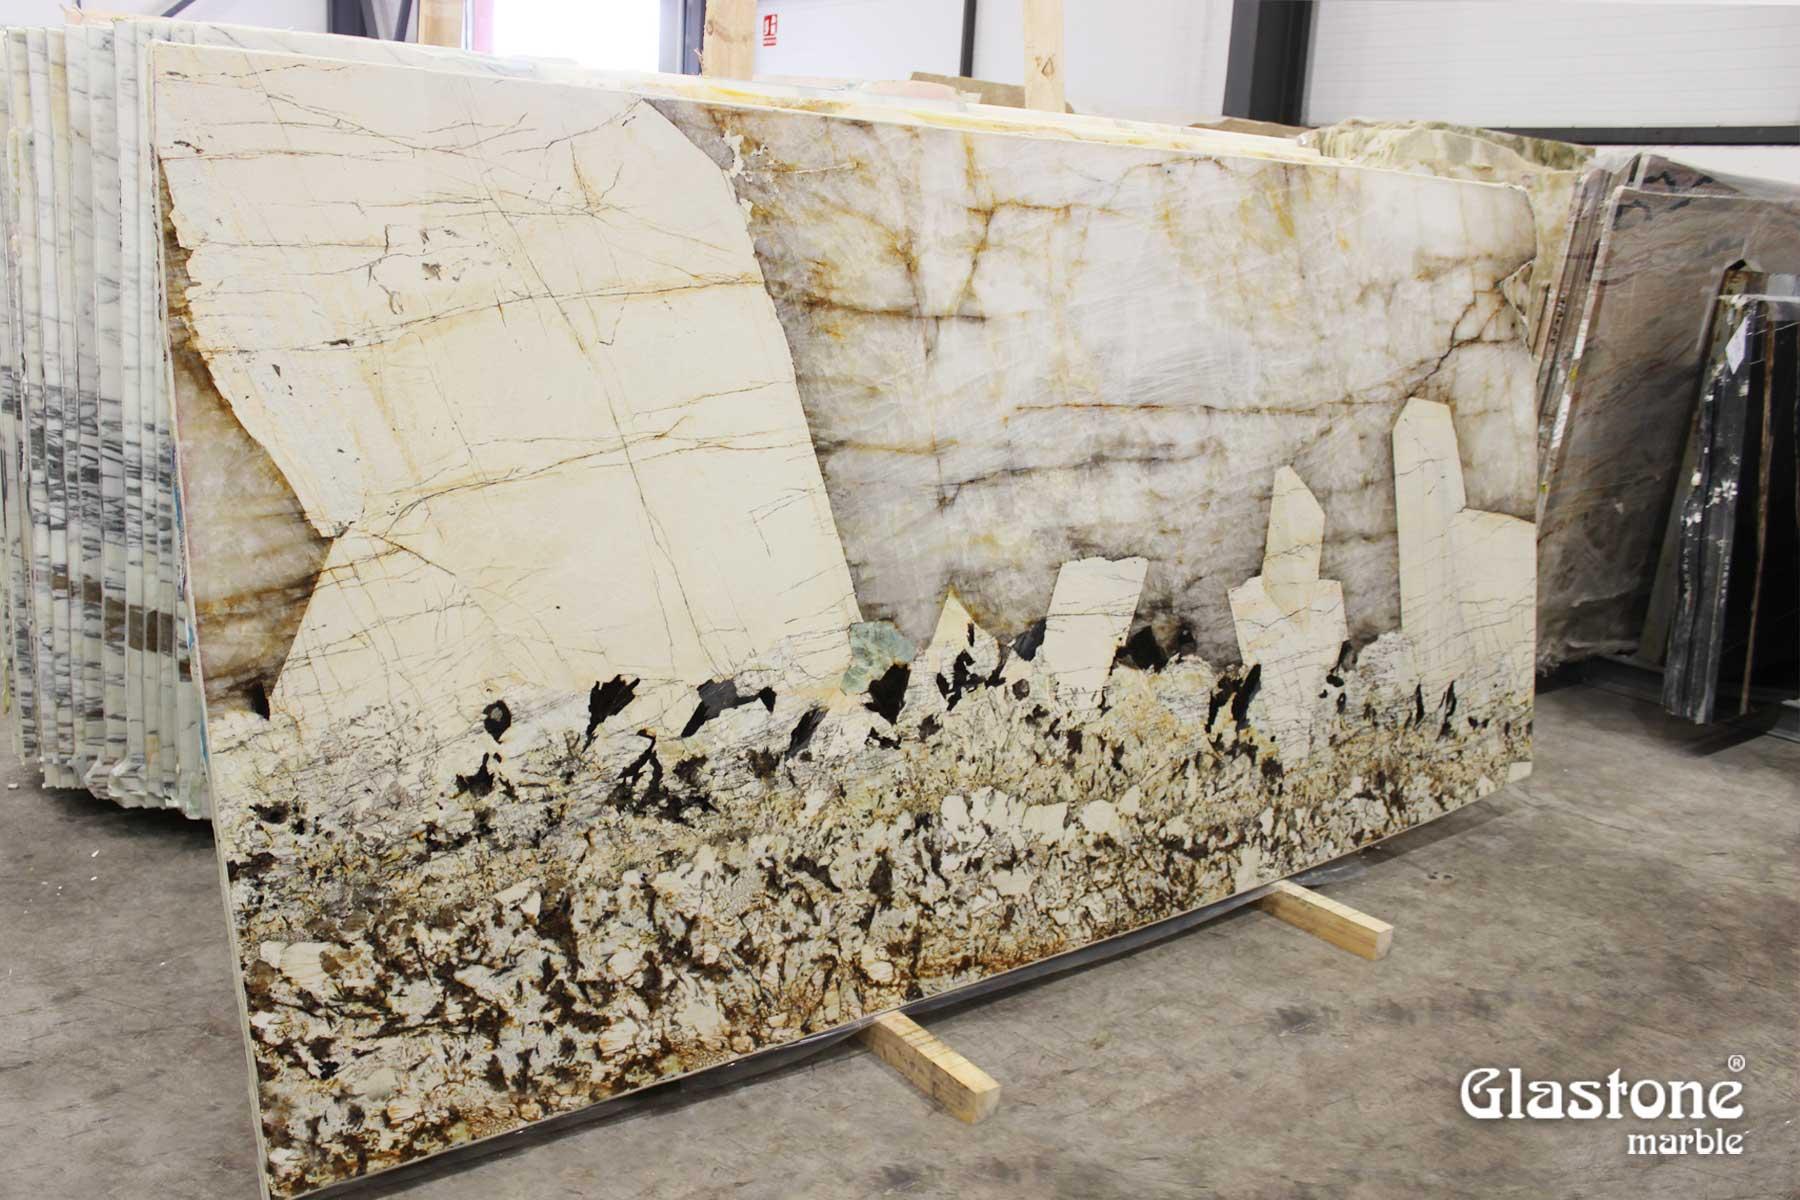 glastone marble marmol solerialaminado vidrio marmol natural patagonia